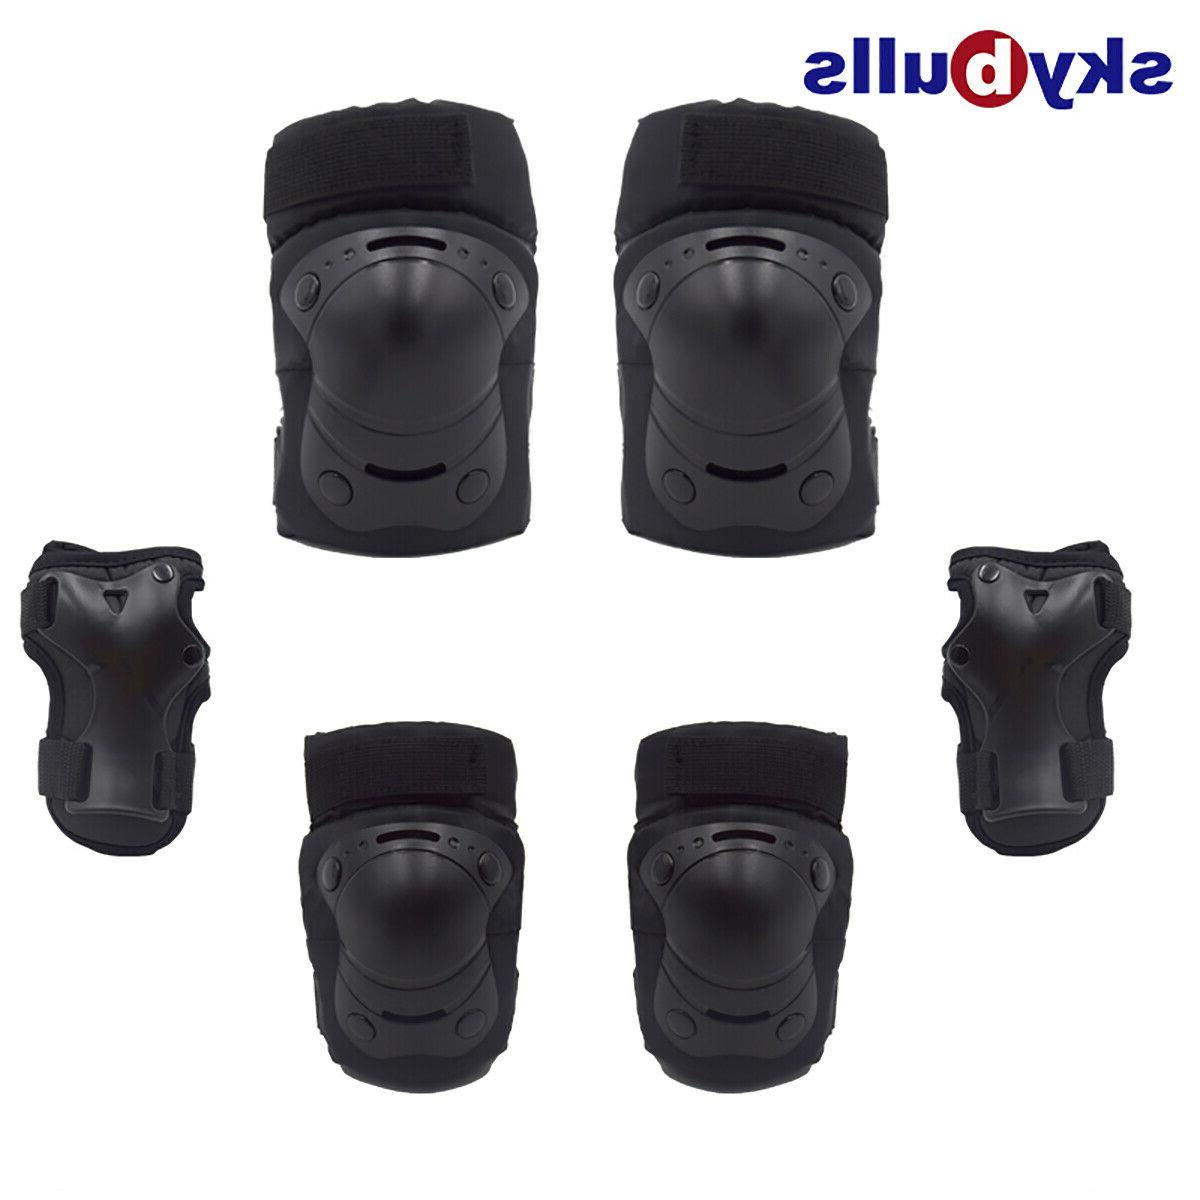 6x Knee Pads Protective Gear Kids